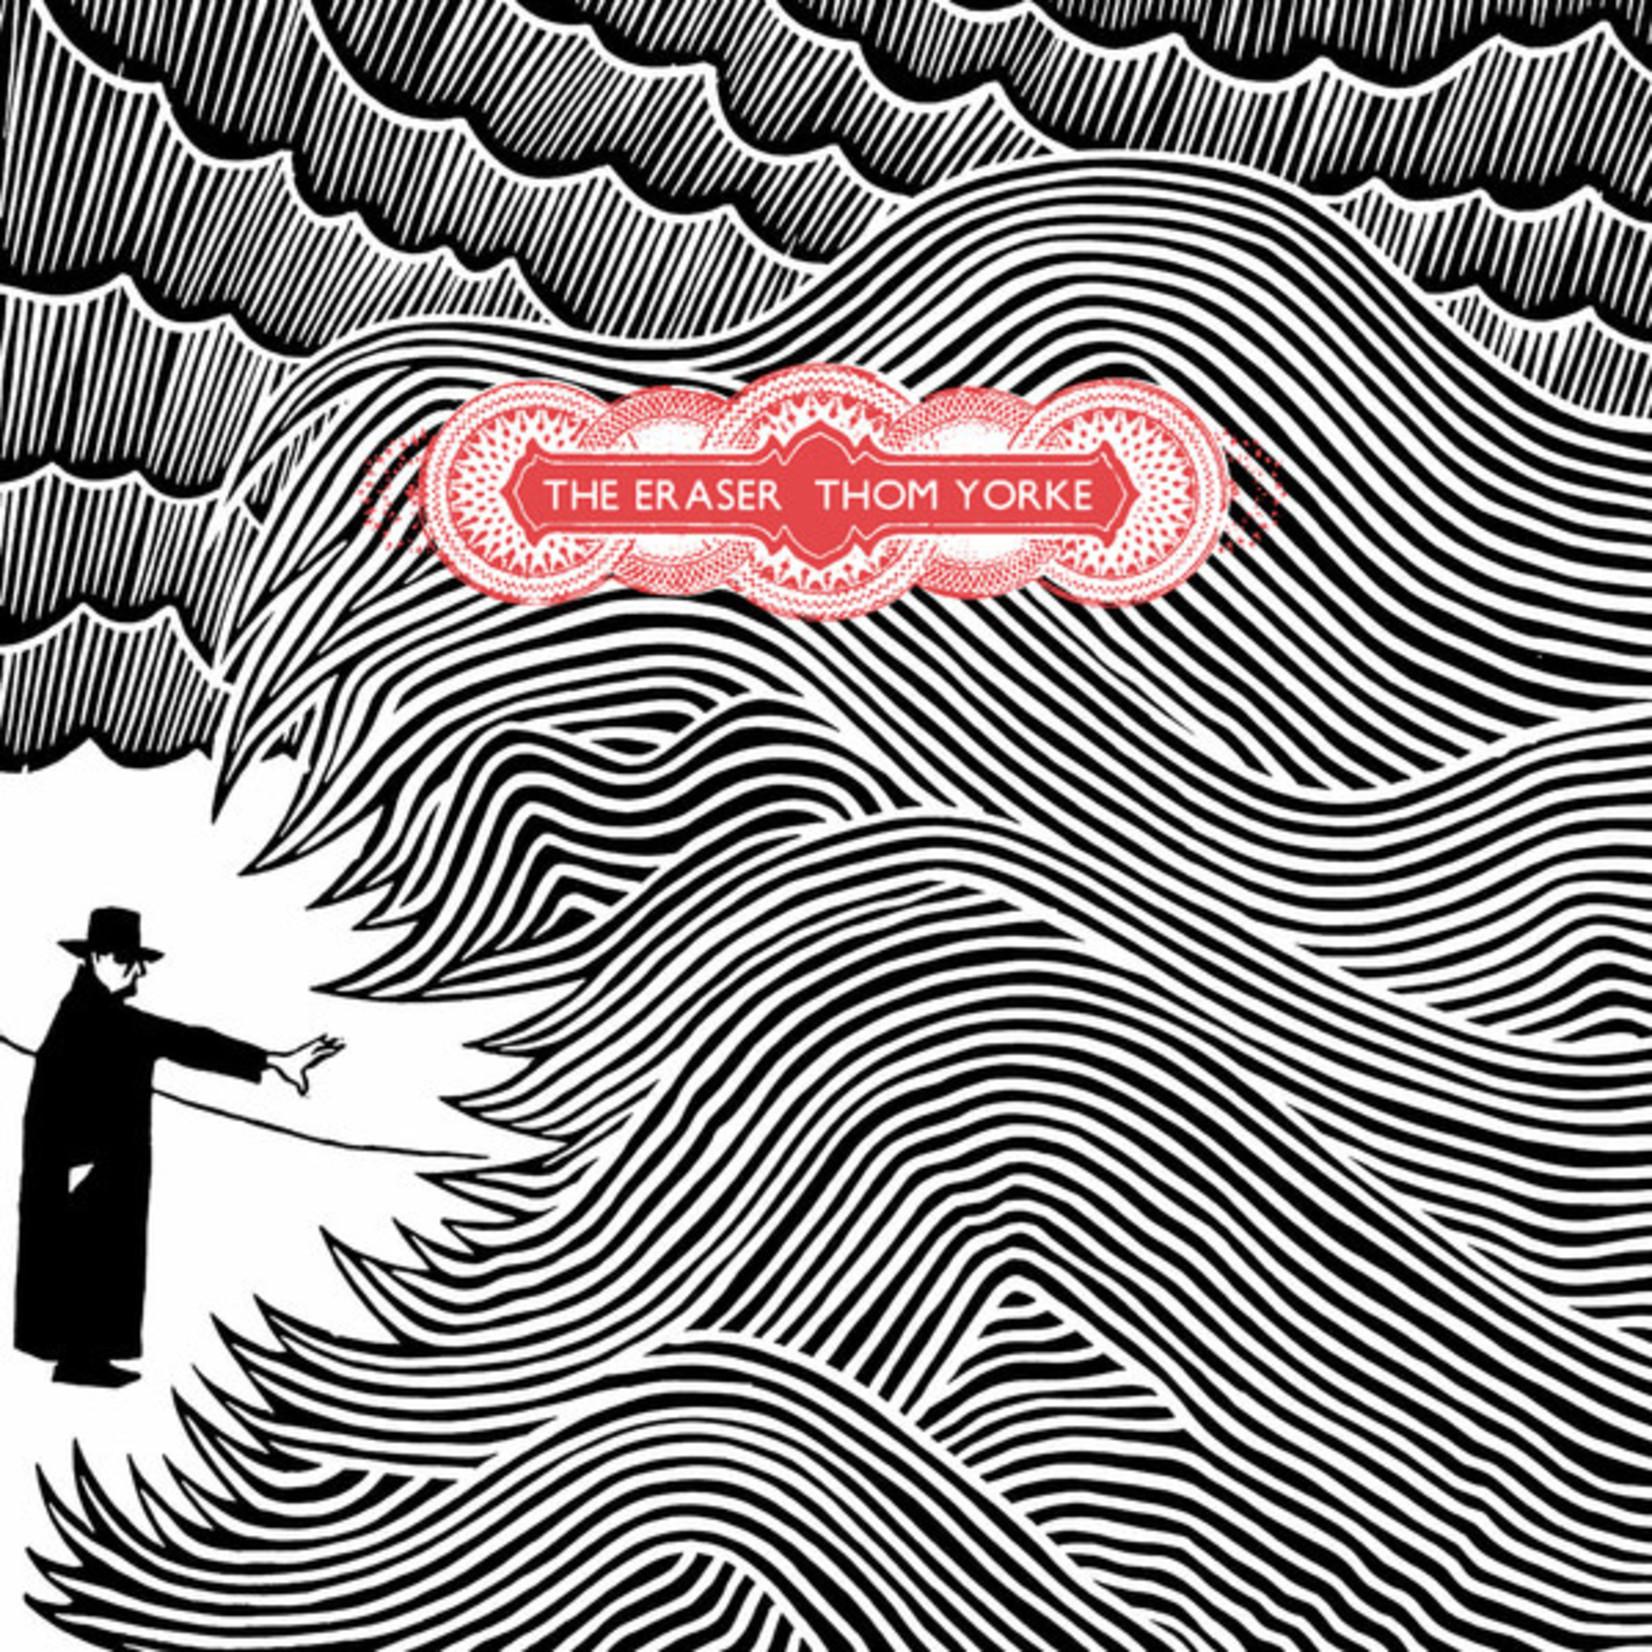 [New] Yorke, Thom (Radiohead): The Eraser